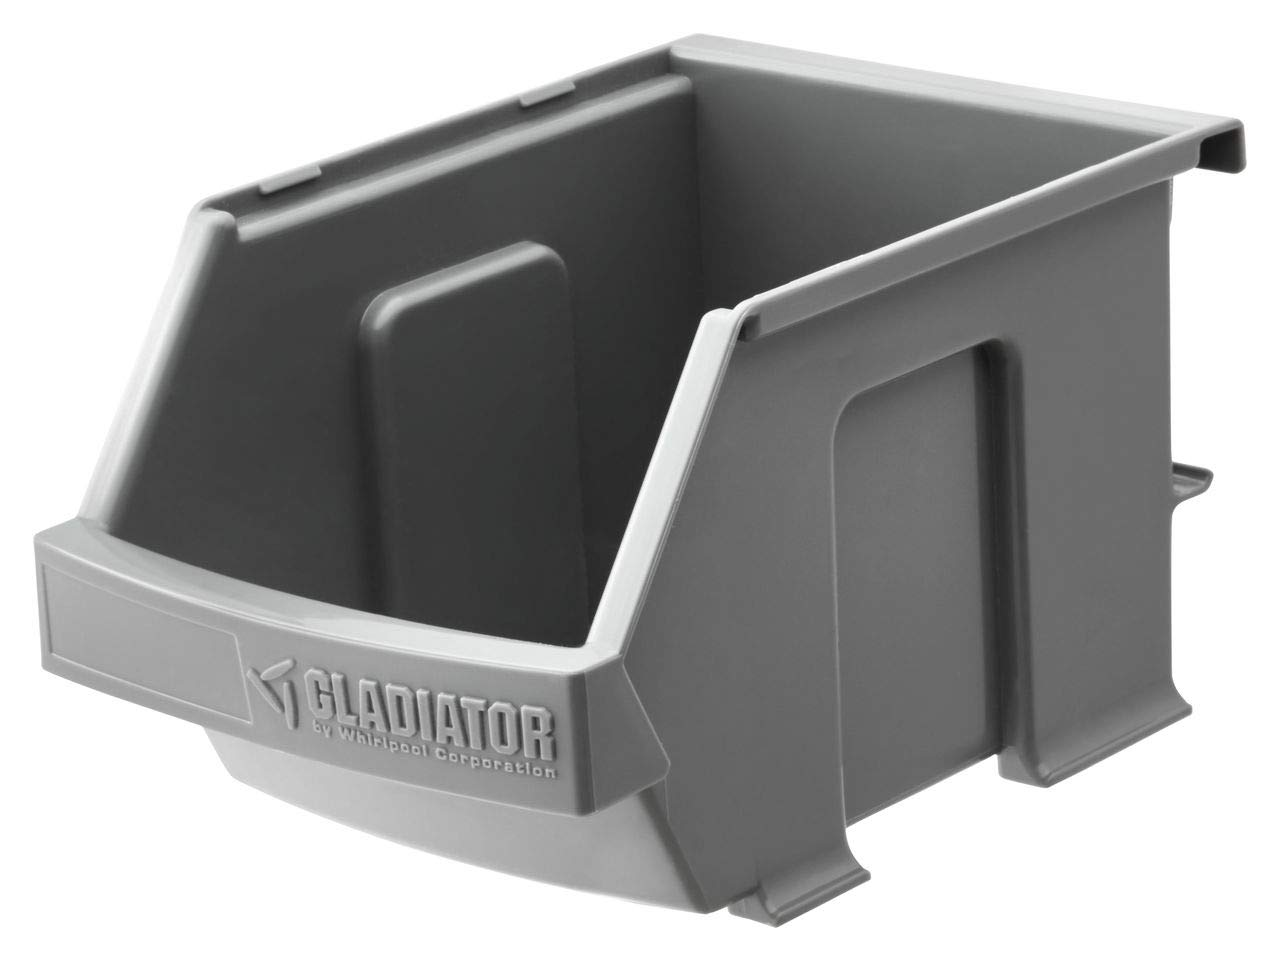 Gladiator GarageWorks GAWESB3PGC (3-Pack) Small Item Bins, Gray